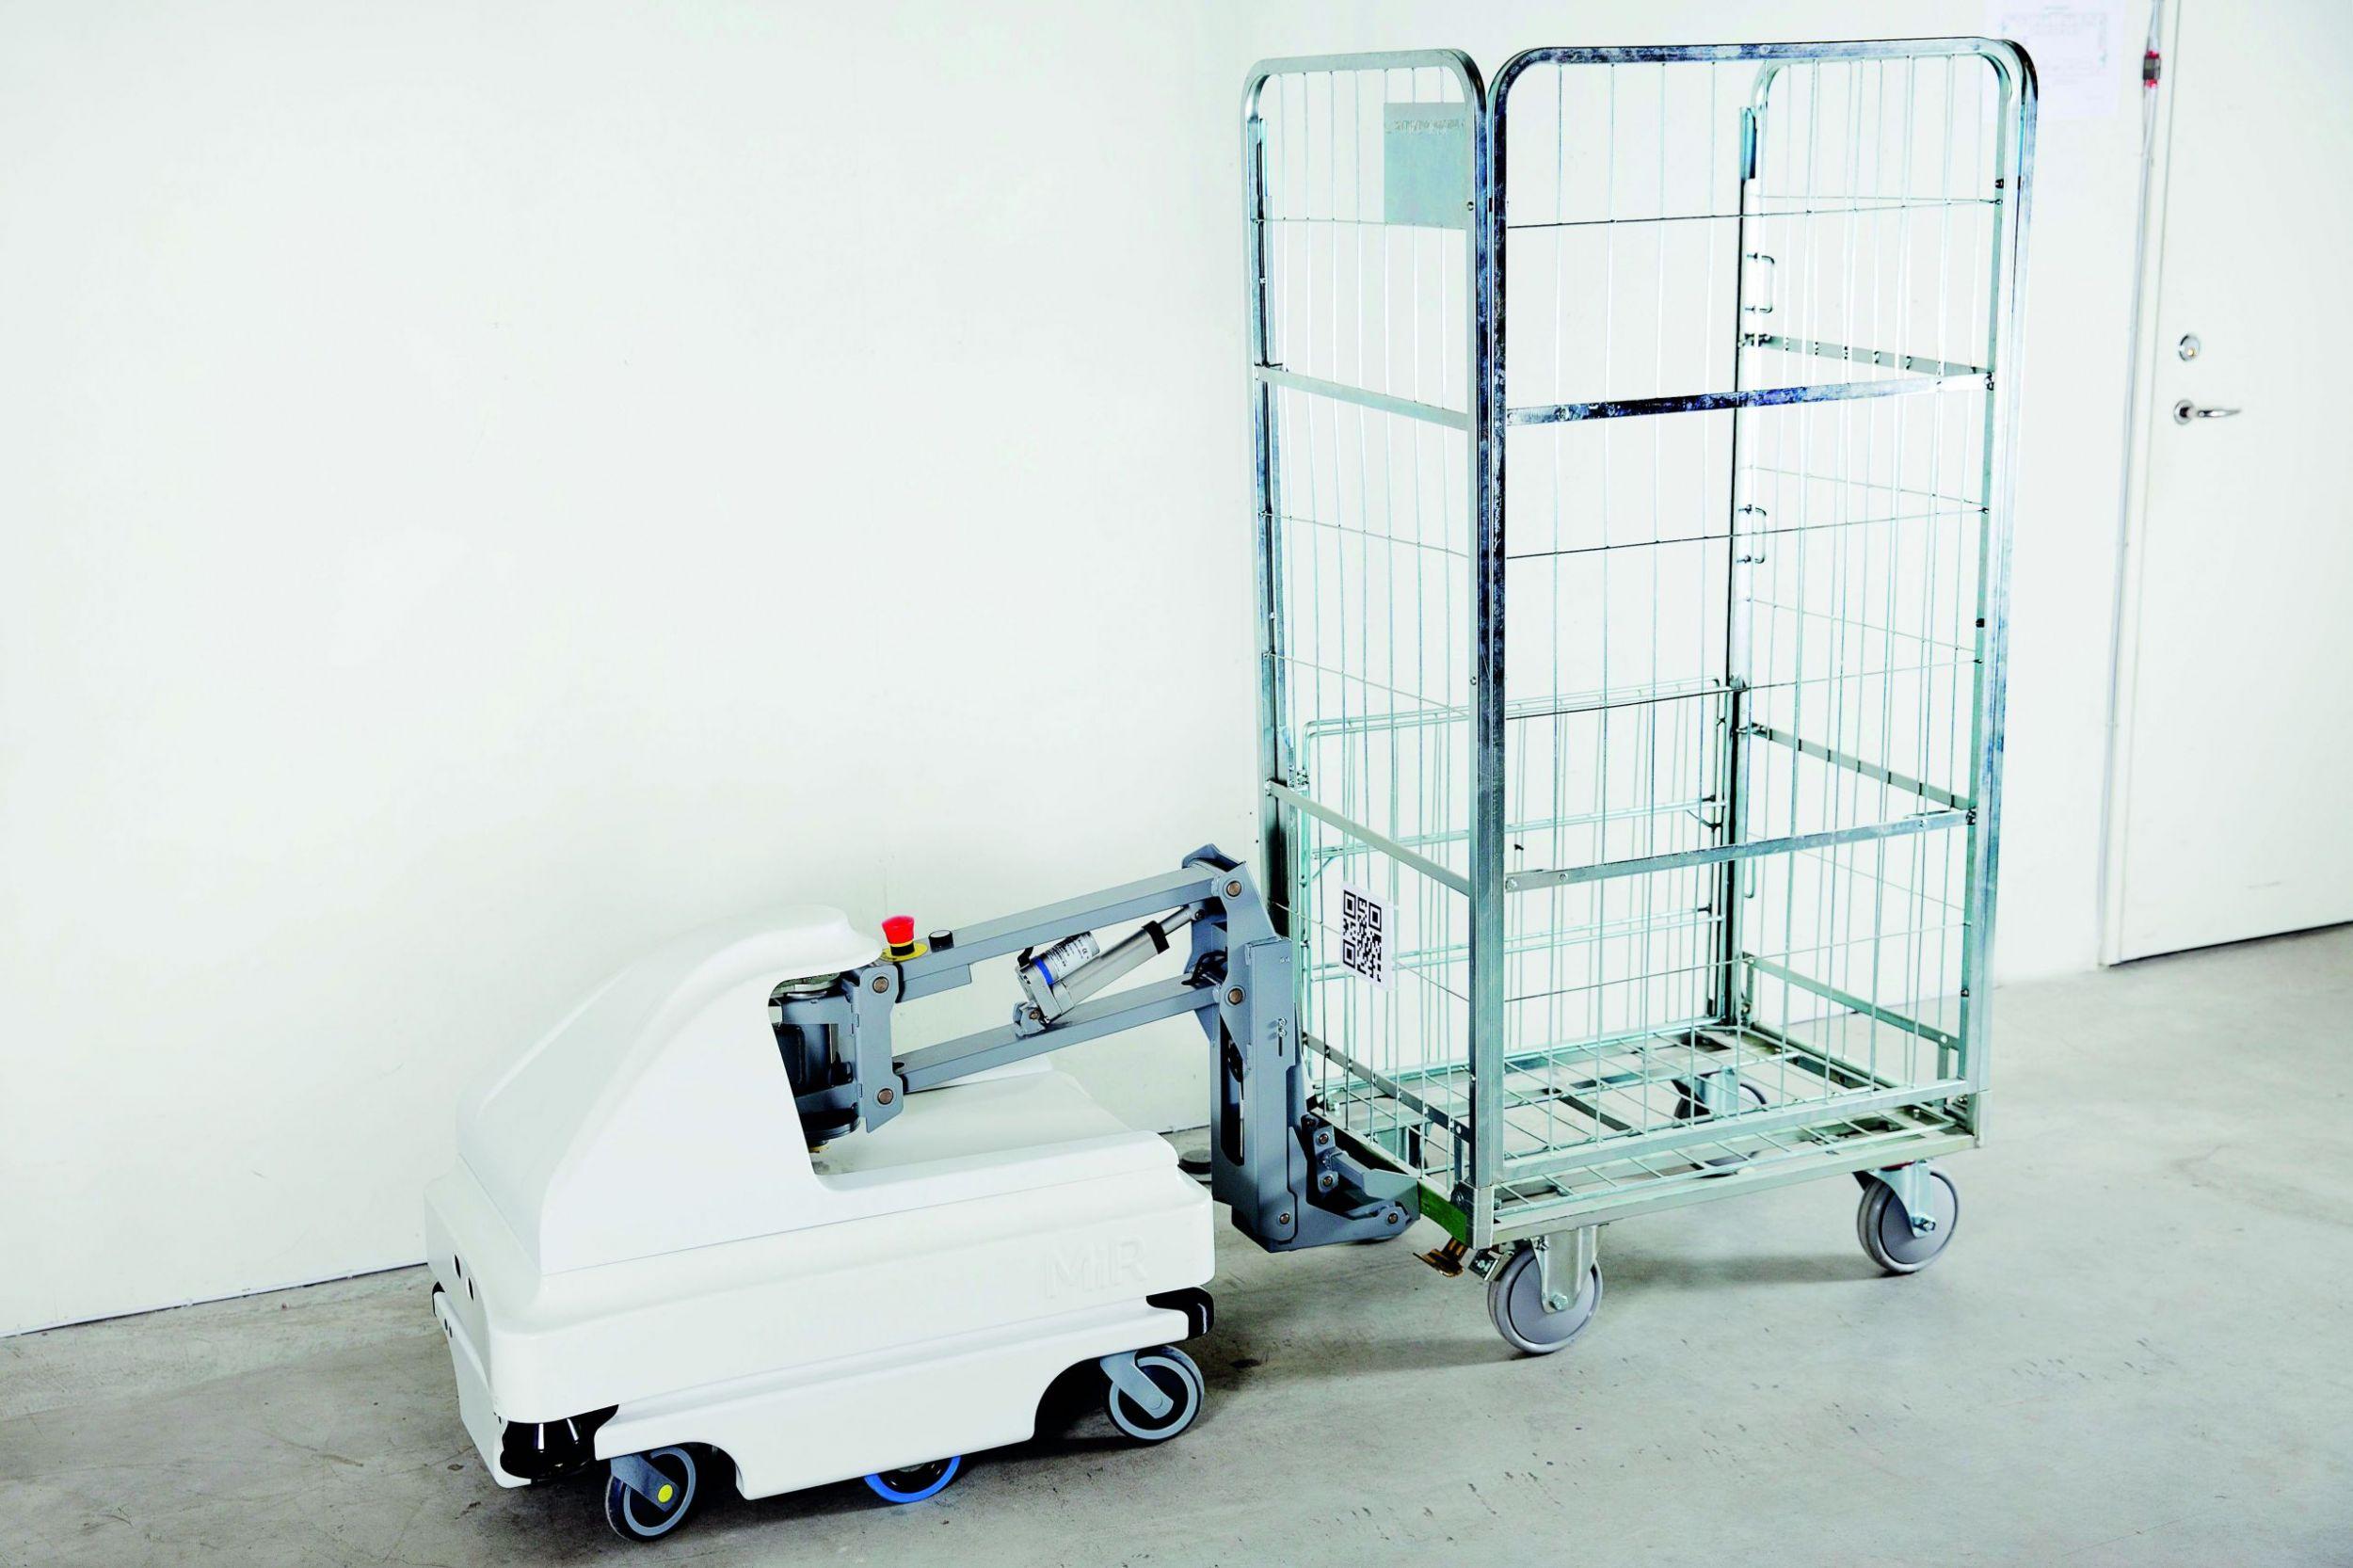 Multifunktionsfähiges Transport- und Ziehsystem